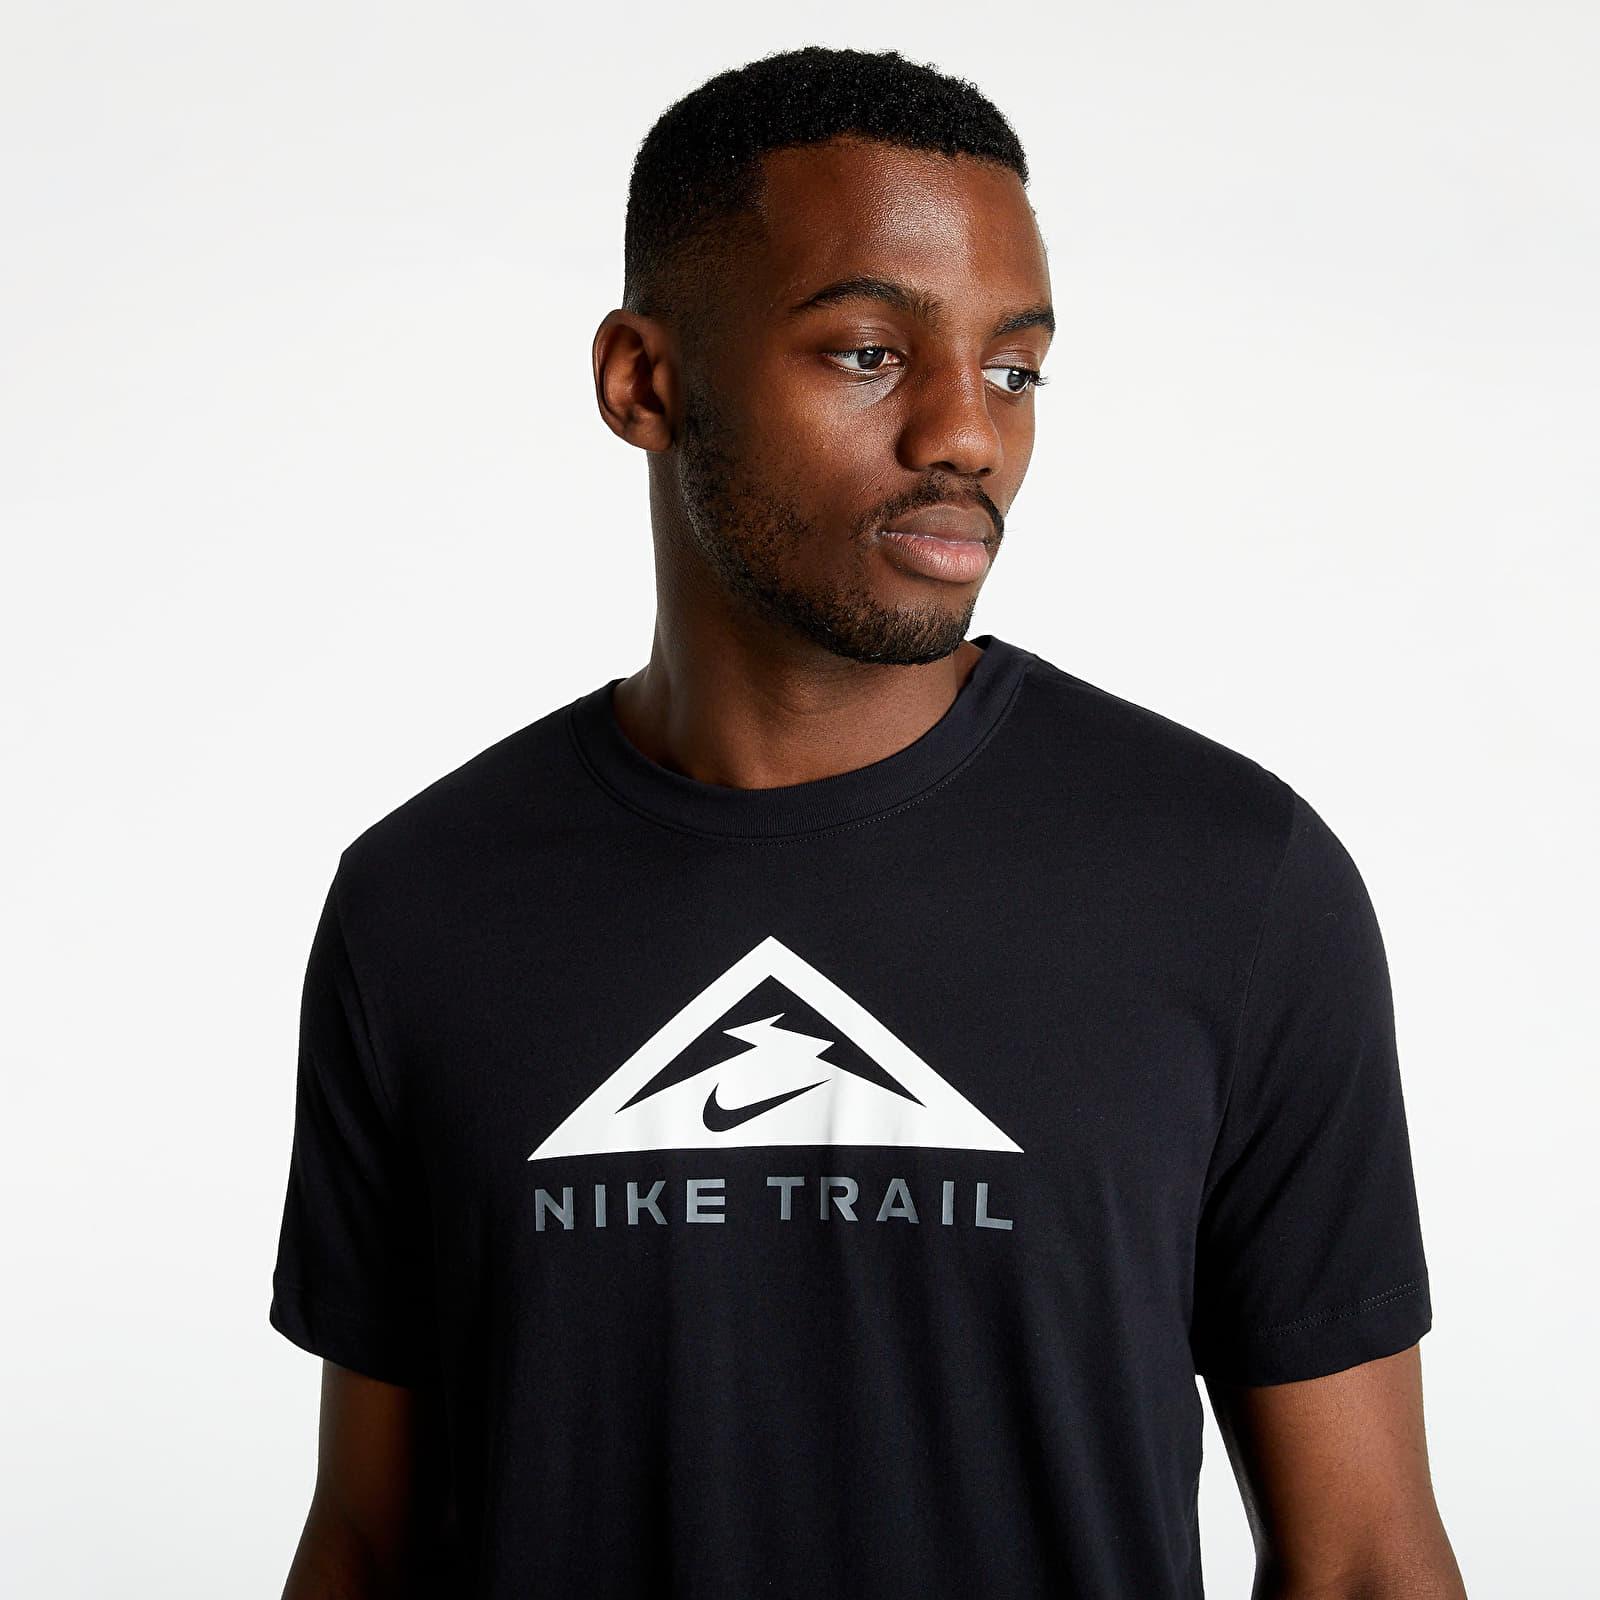 Nike Dri-Fit Short Sleeved Tee Trail Black S